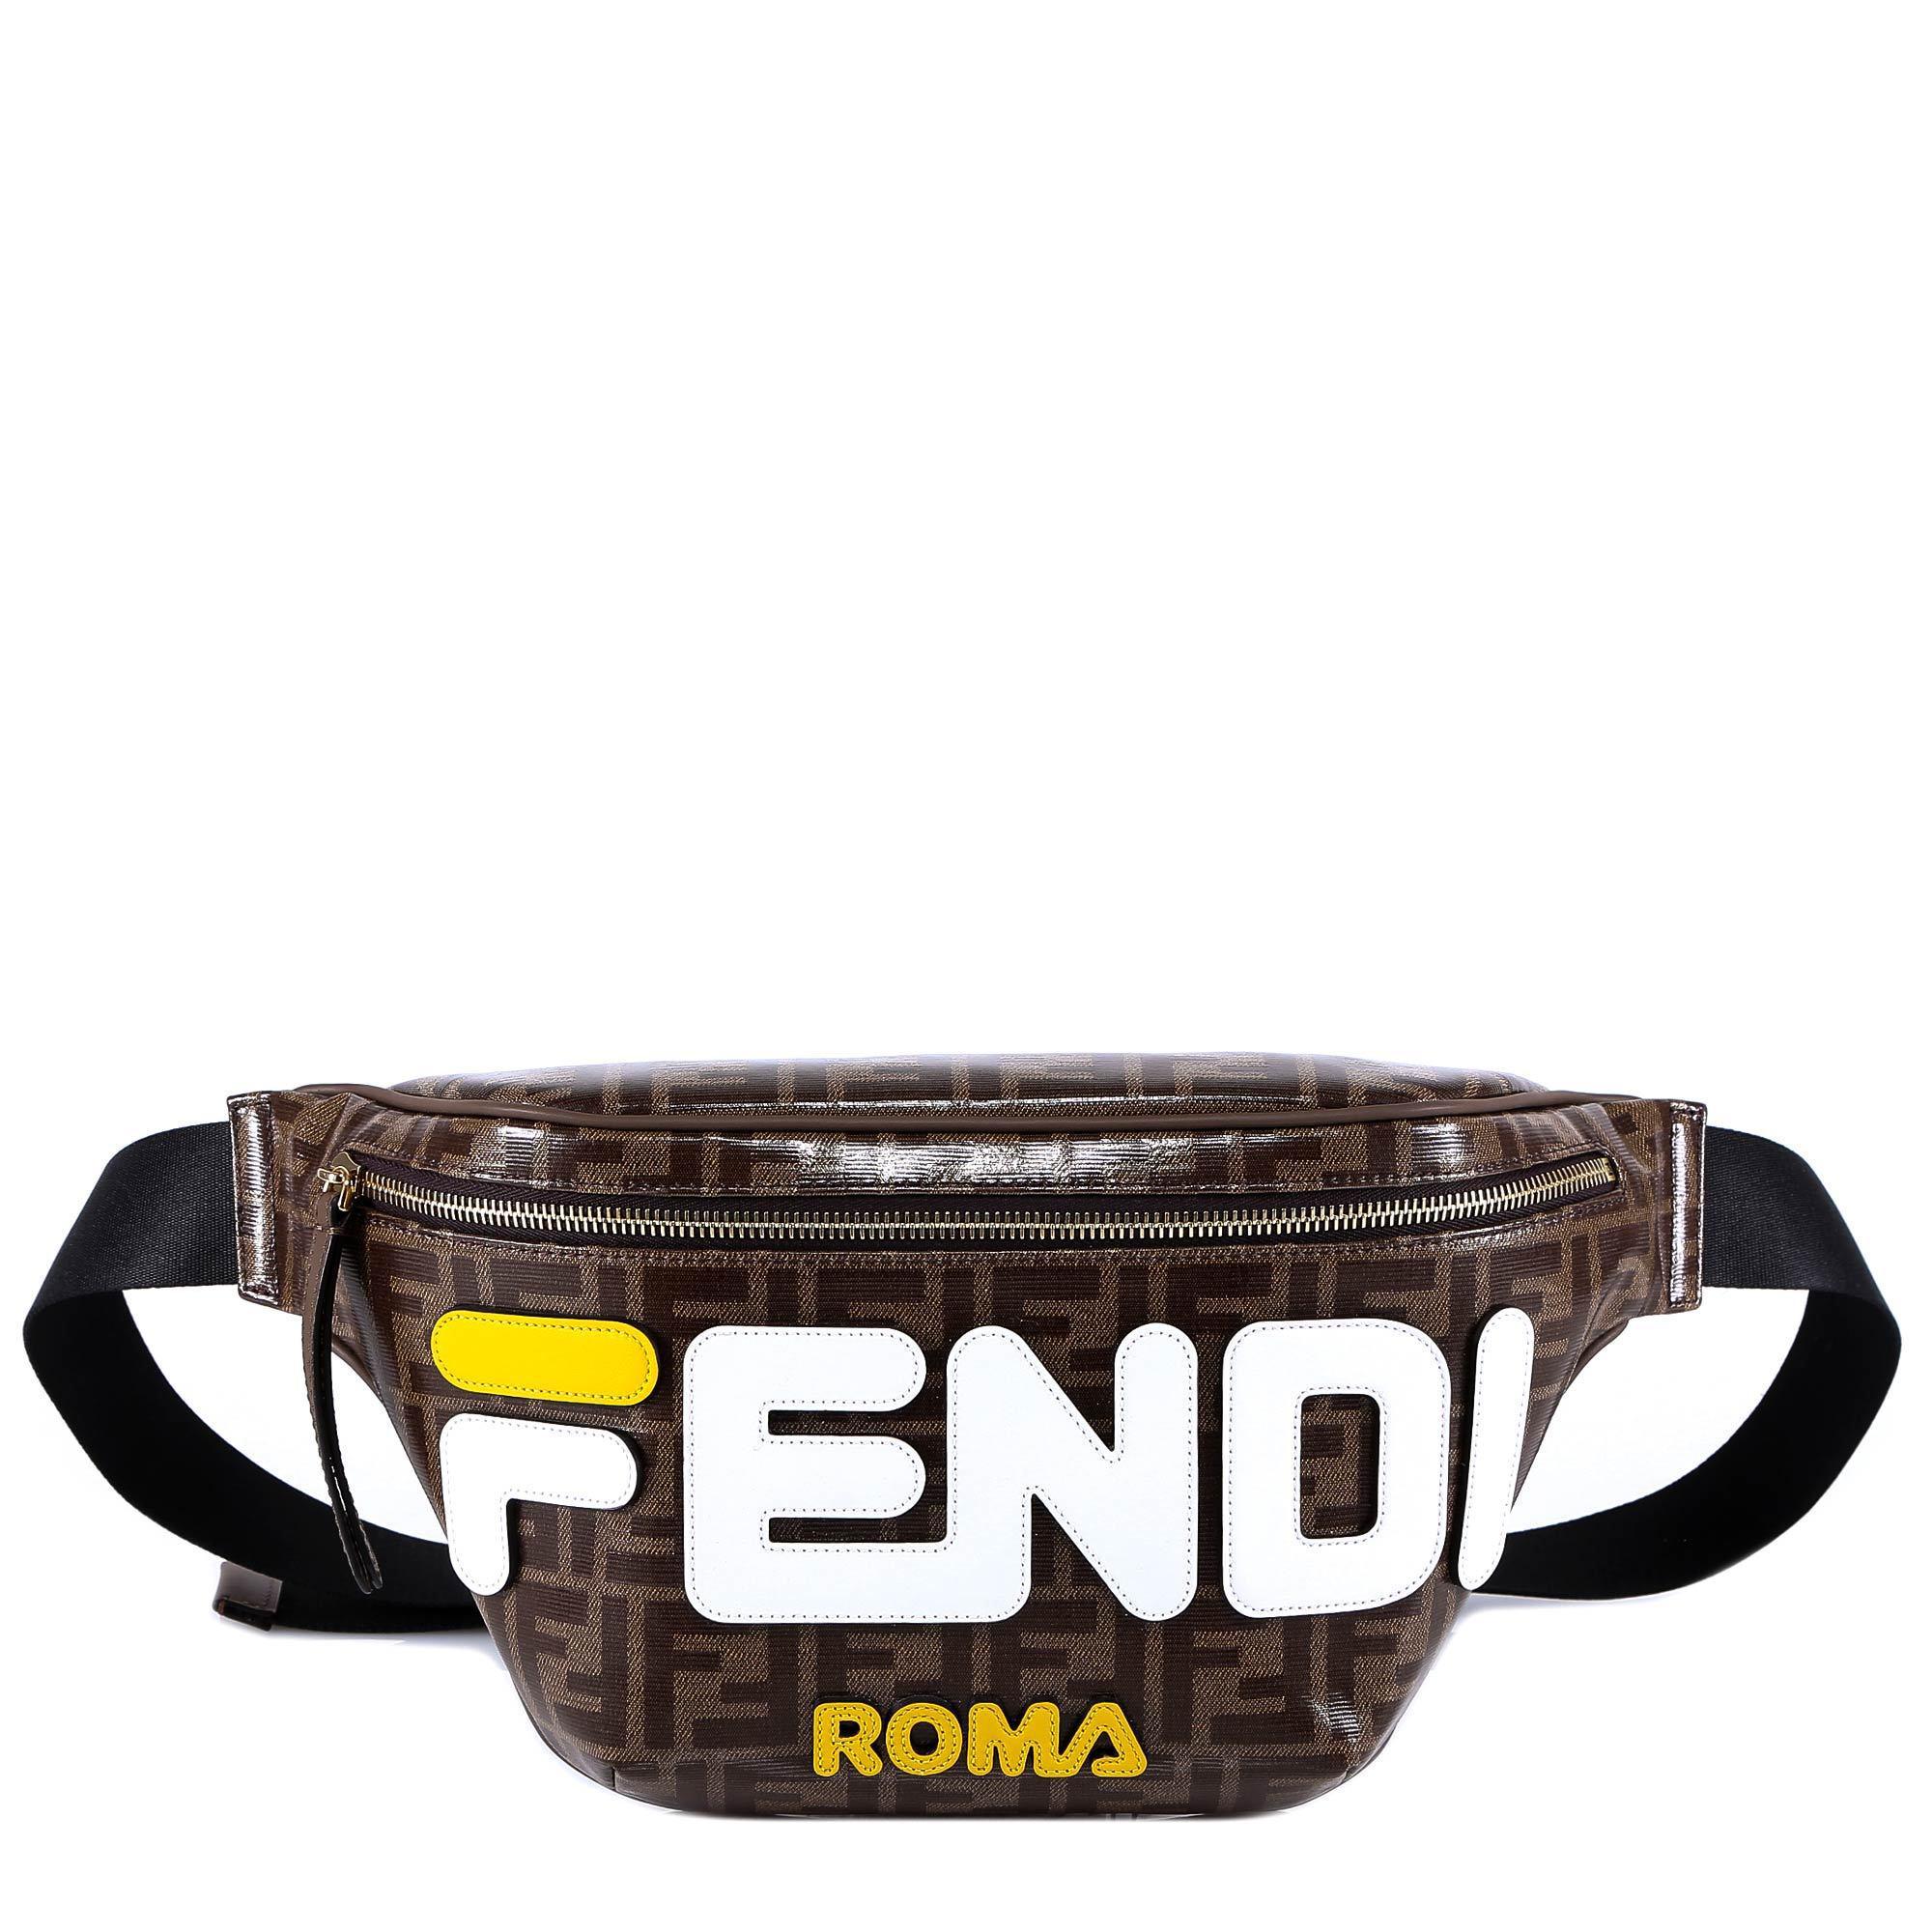 915bb02aee Fendi Ff Fila Belt Bag for Men - Lyst